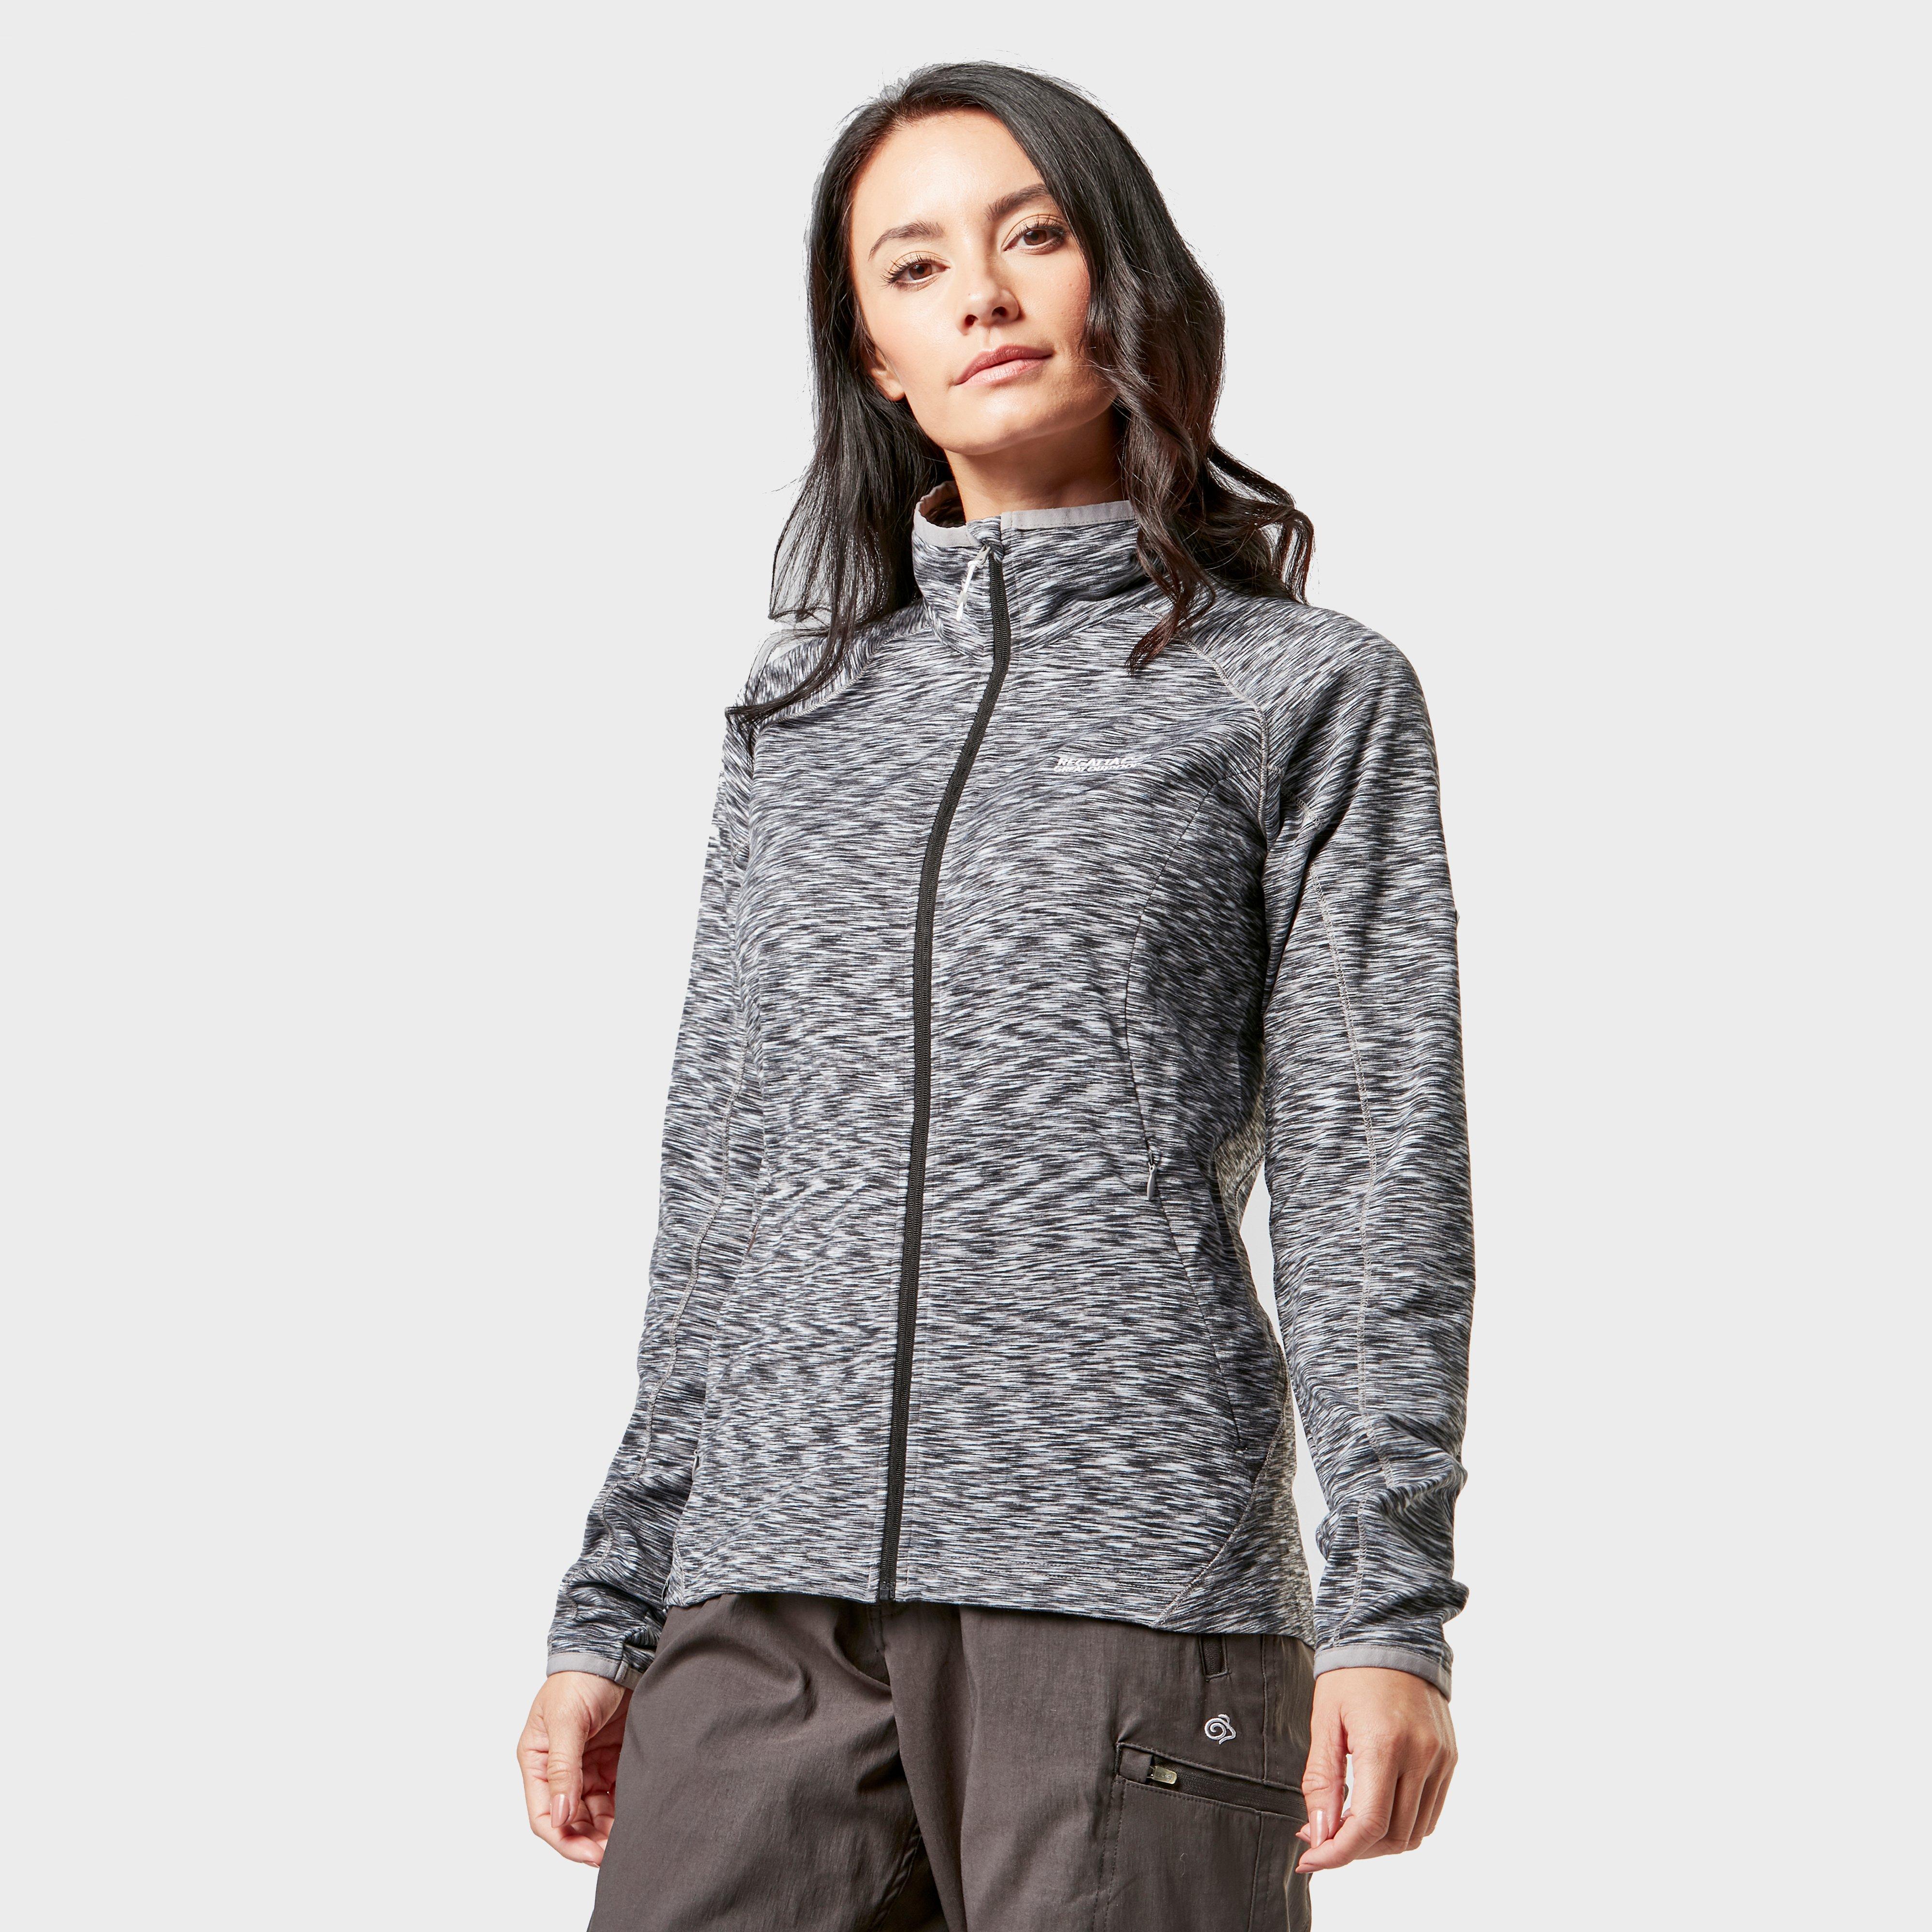 Regatta Regatta Womens Harty Full-Zip Fleece - Grey, Grey